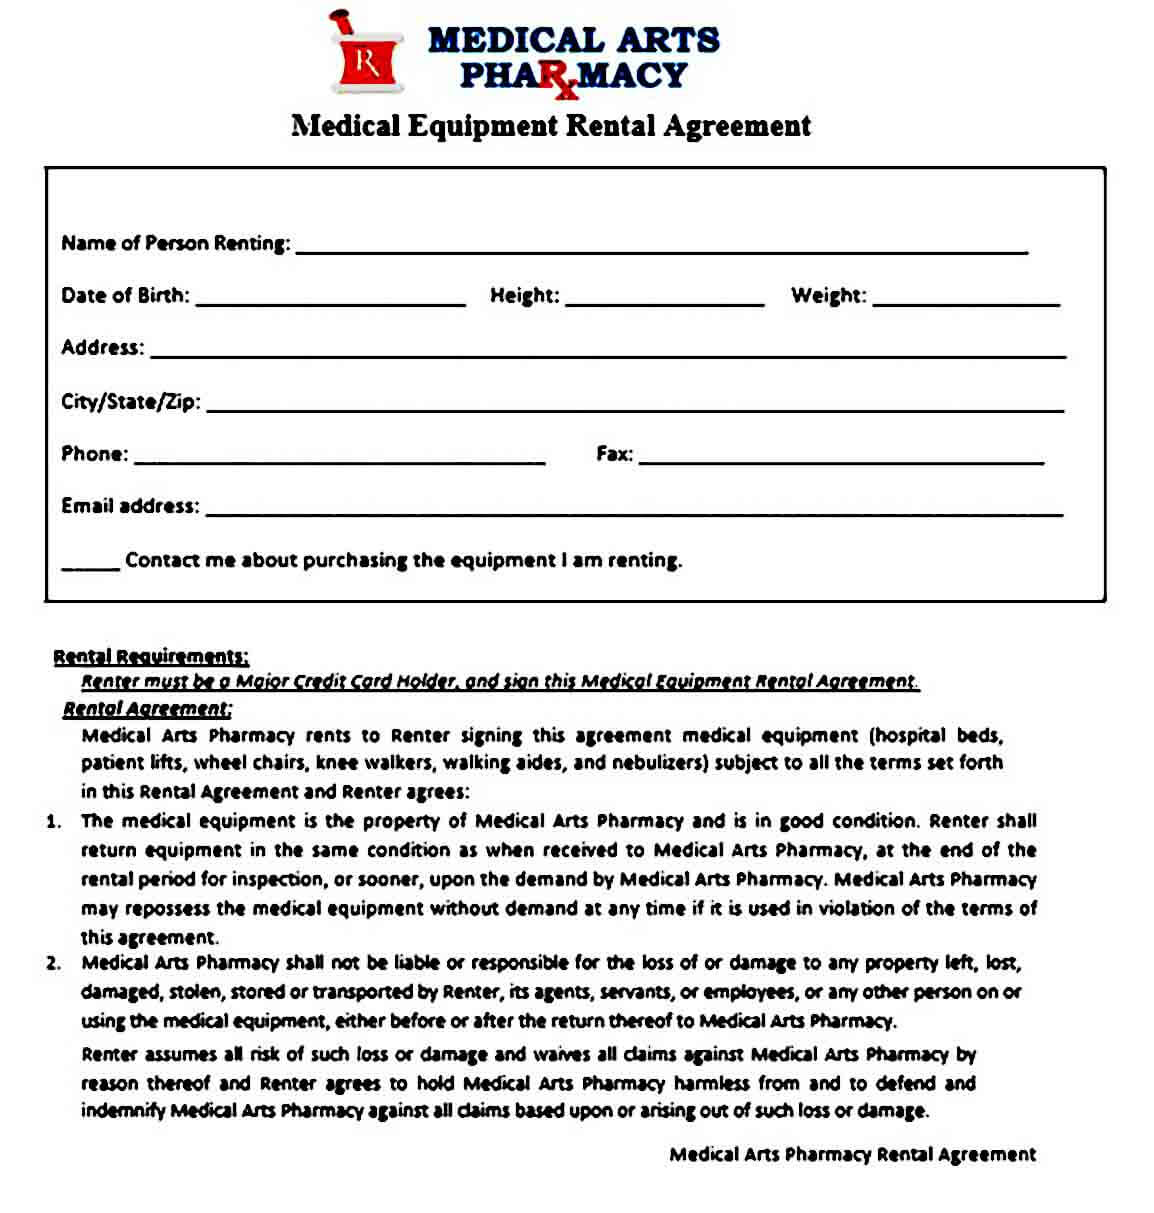 Medical Equipment Rental Agreement Example